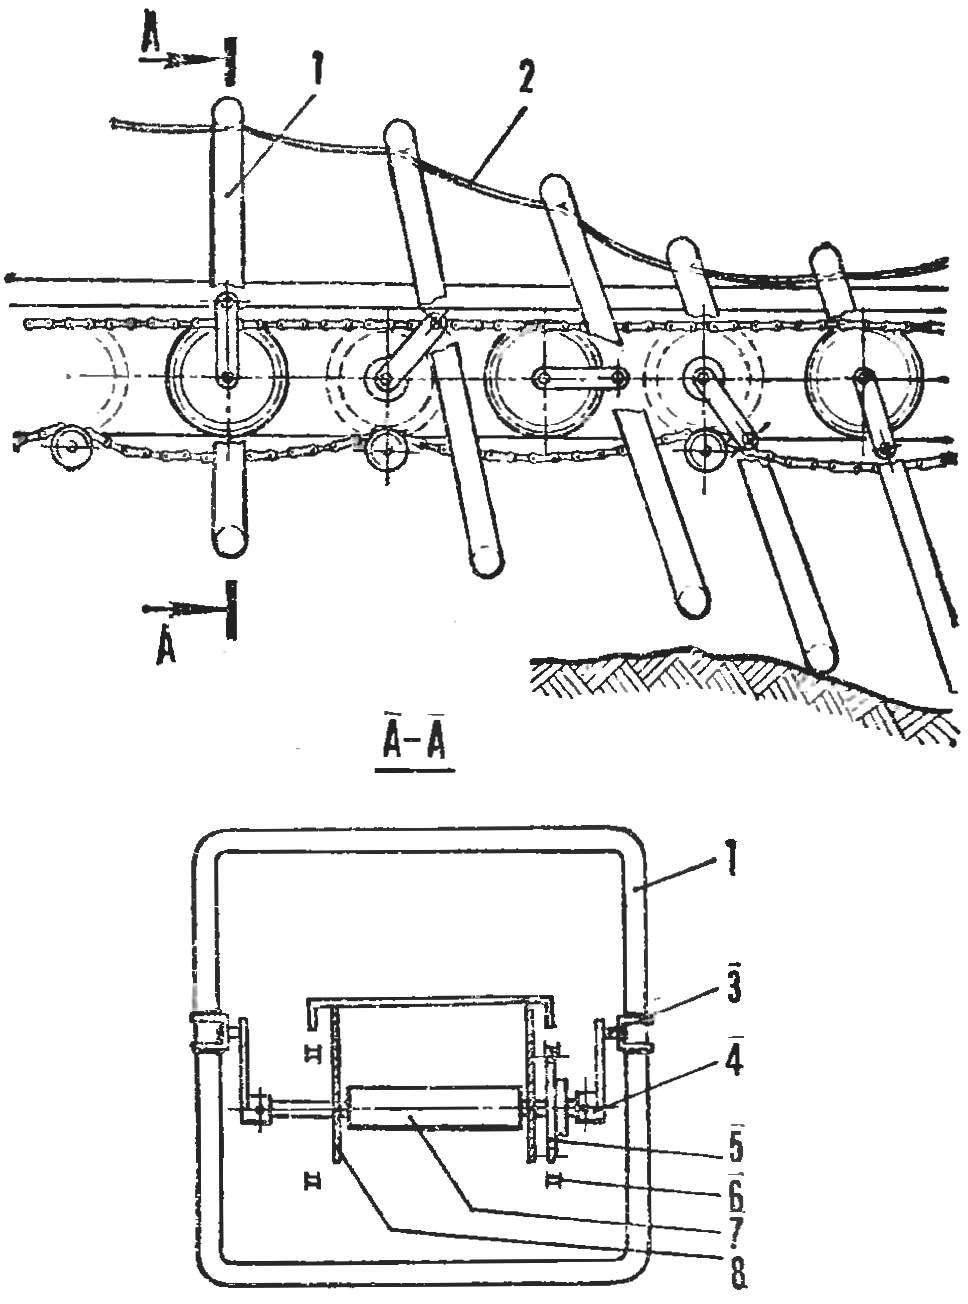 Рис. 4. Конструкция движителя волнохода